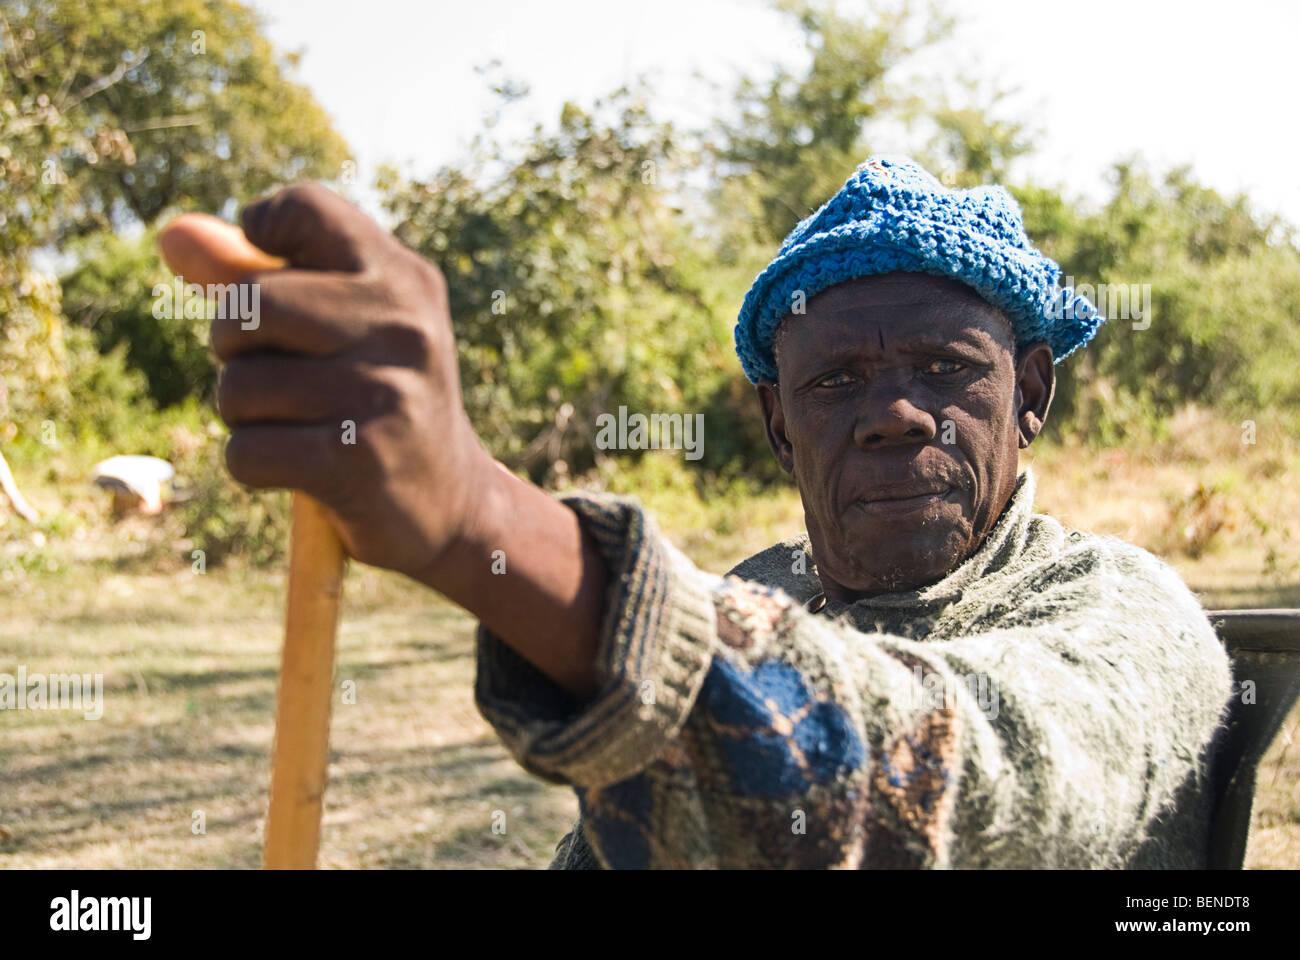 Old man looking strait to the camera, Okavango delta, Botswana, Africa. - Stock Image